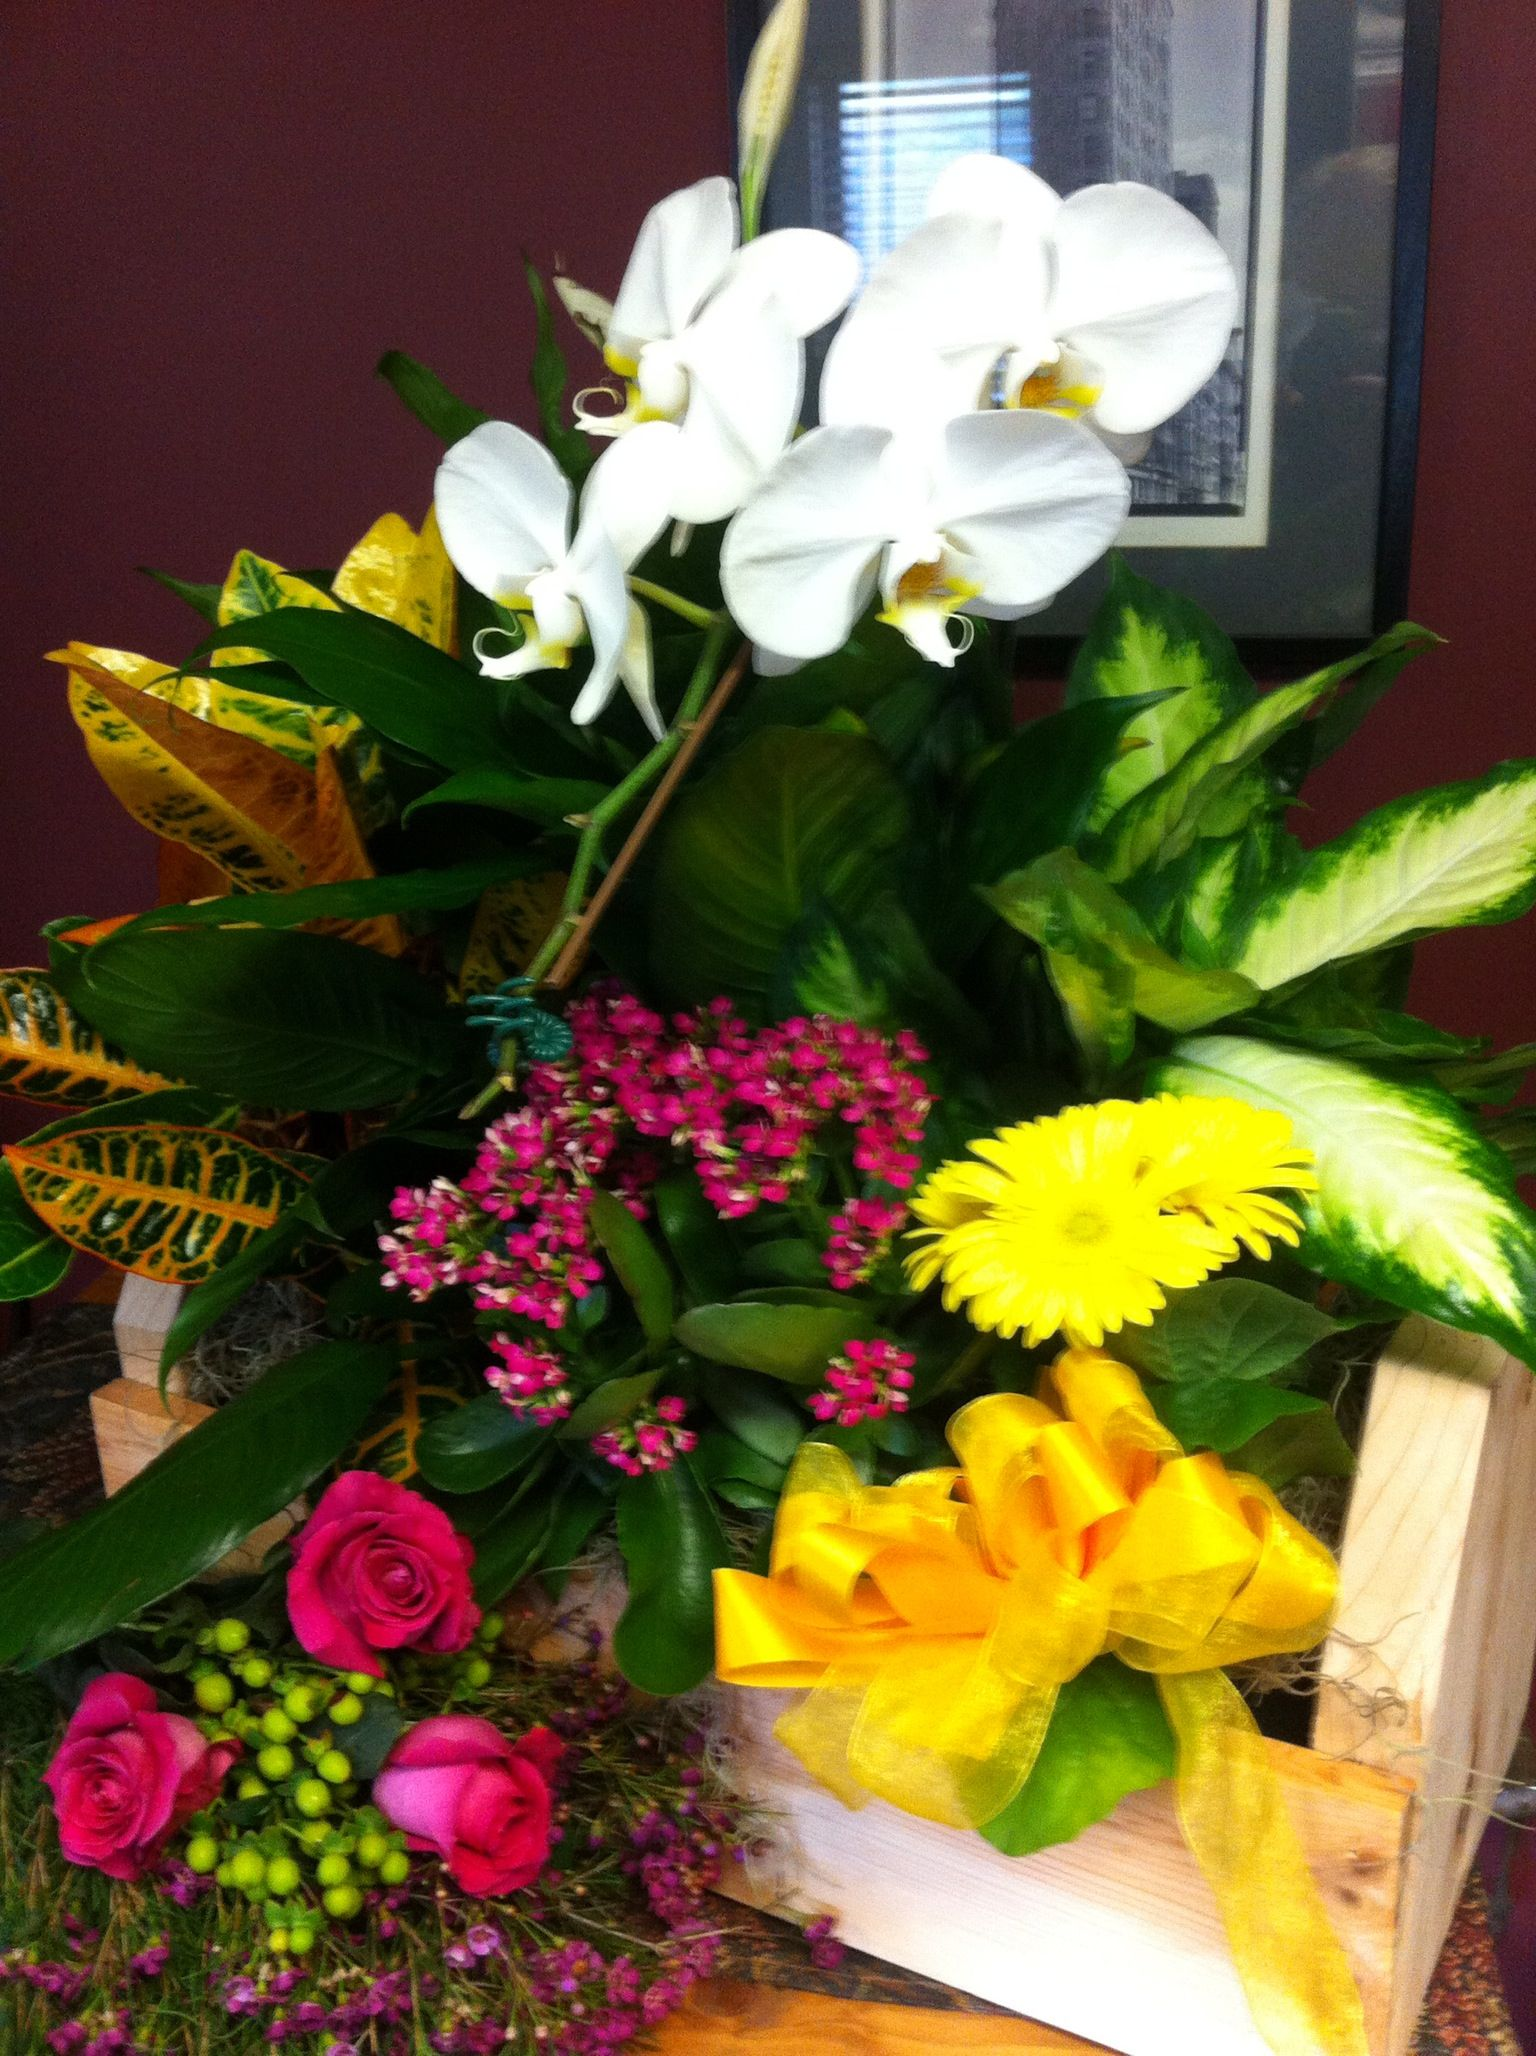 Box of blooms plants bloom garden landscaping